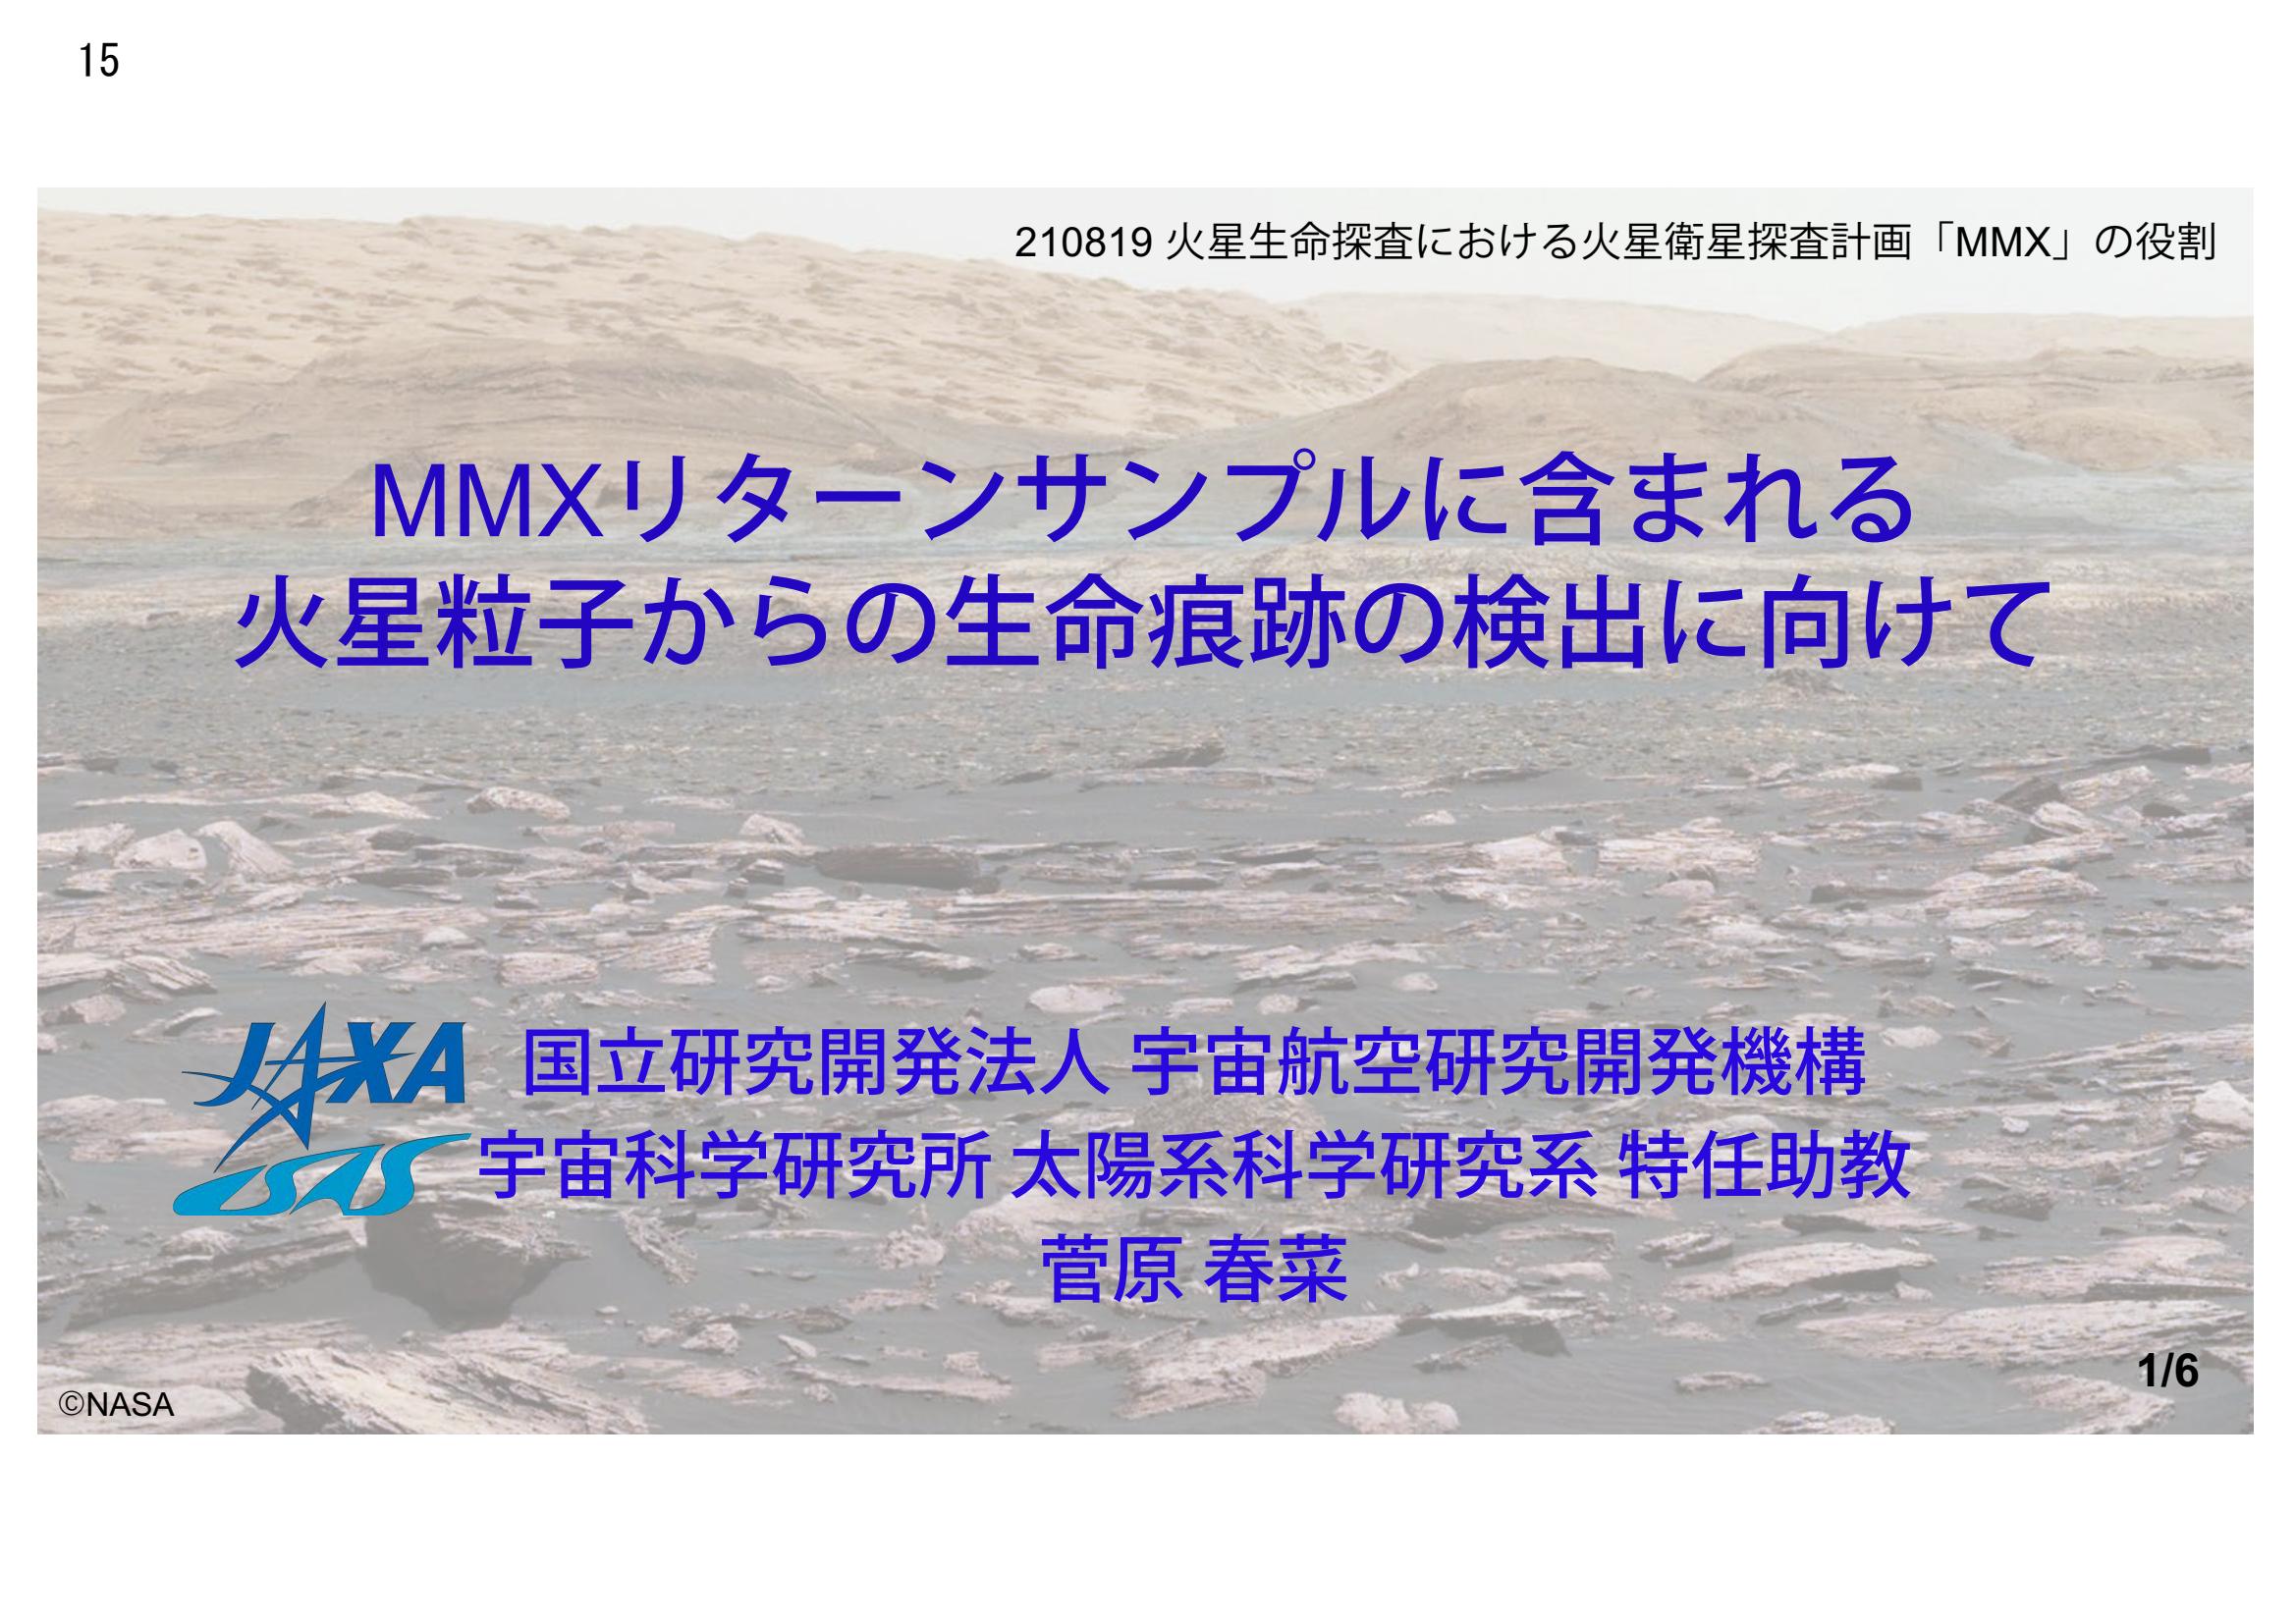 f:id:Imamura:20210819095544p:plain